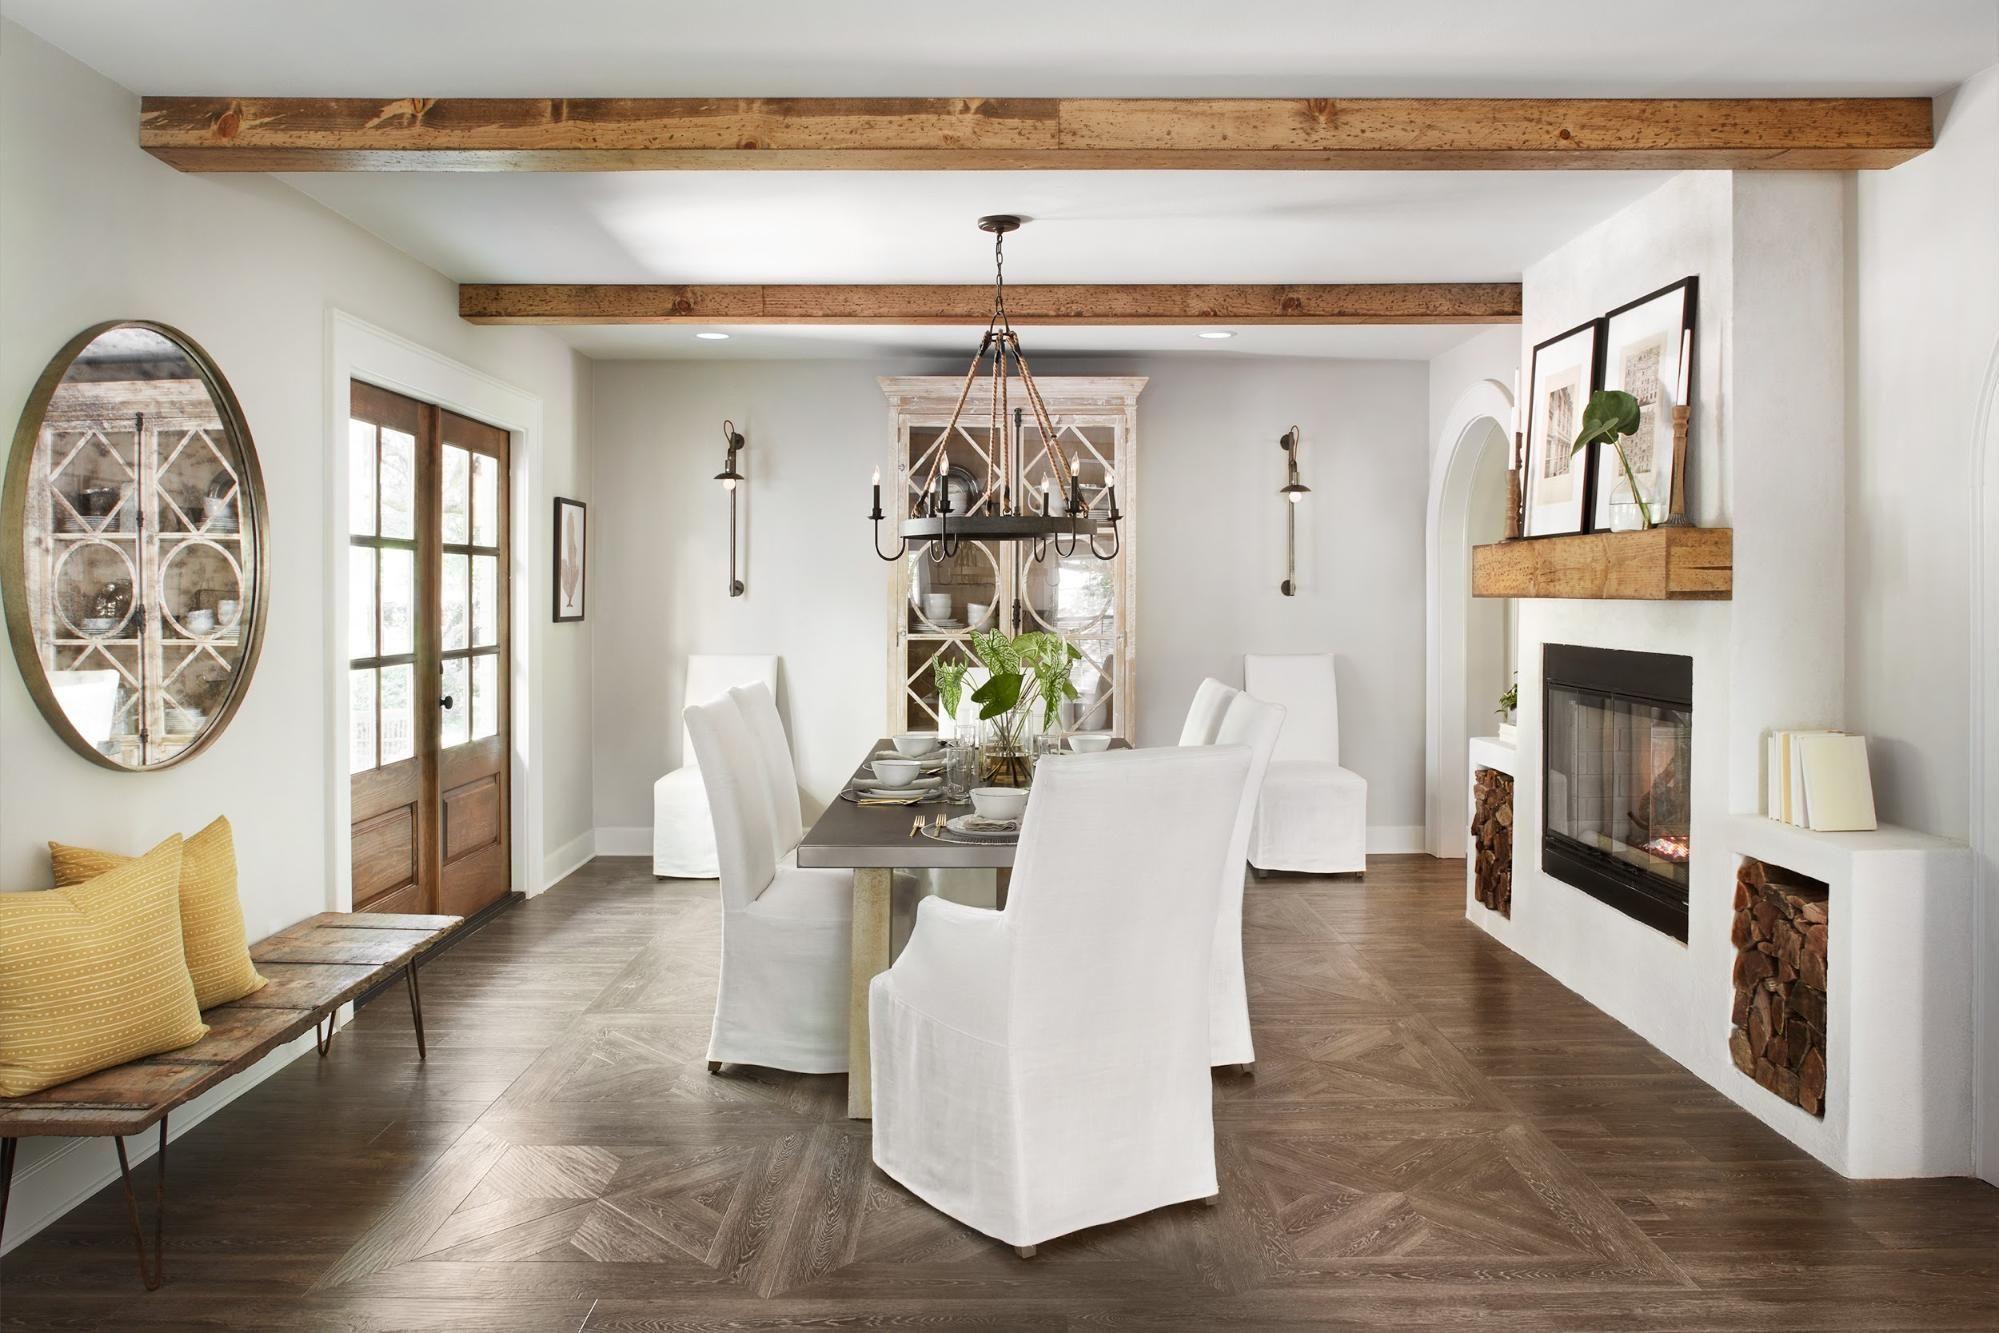 Joanna gaines hallway ideas  Limestone Kitchen Backsplash  Home Ideas  Pinterest  Joanna